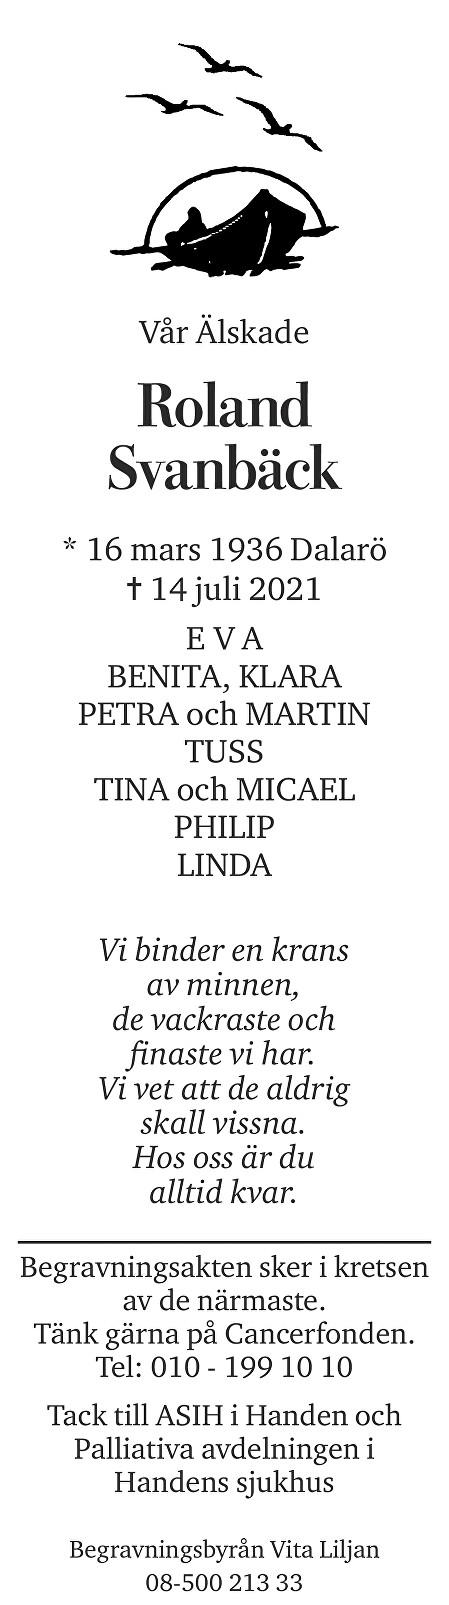 Roland Svanbäck Death notice